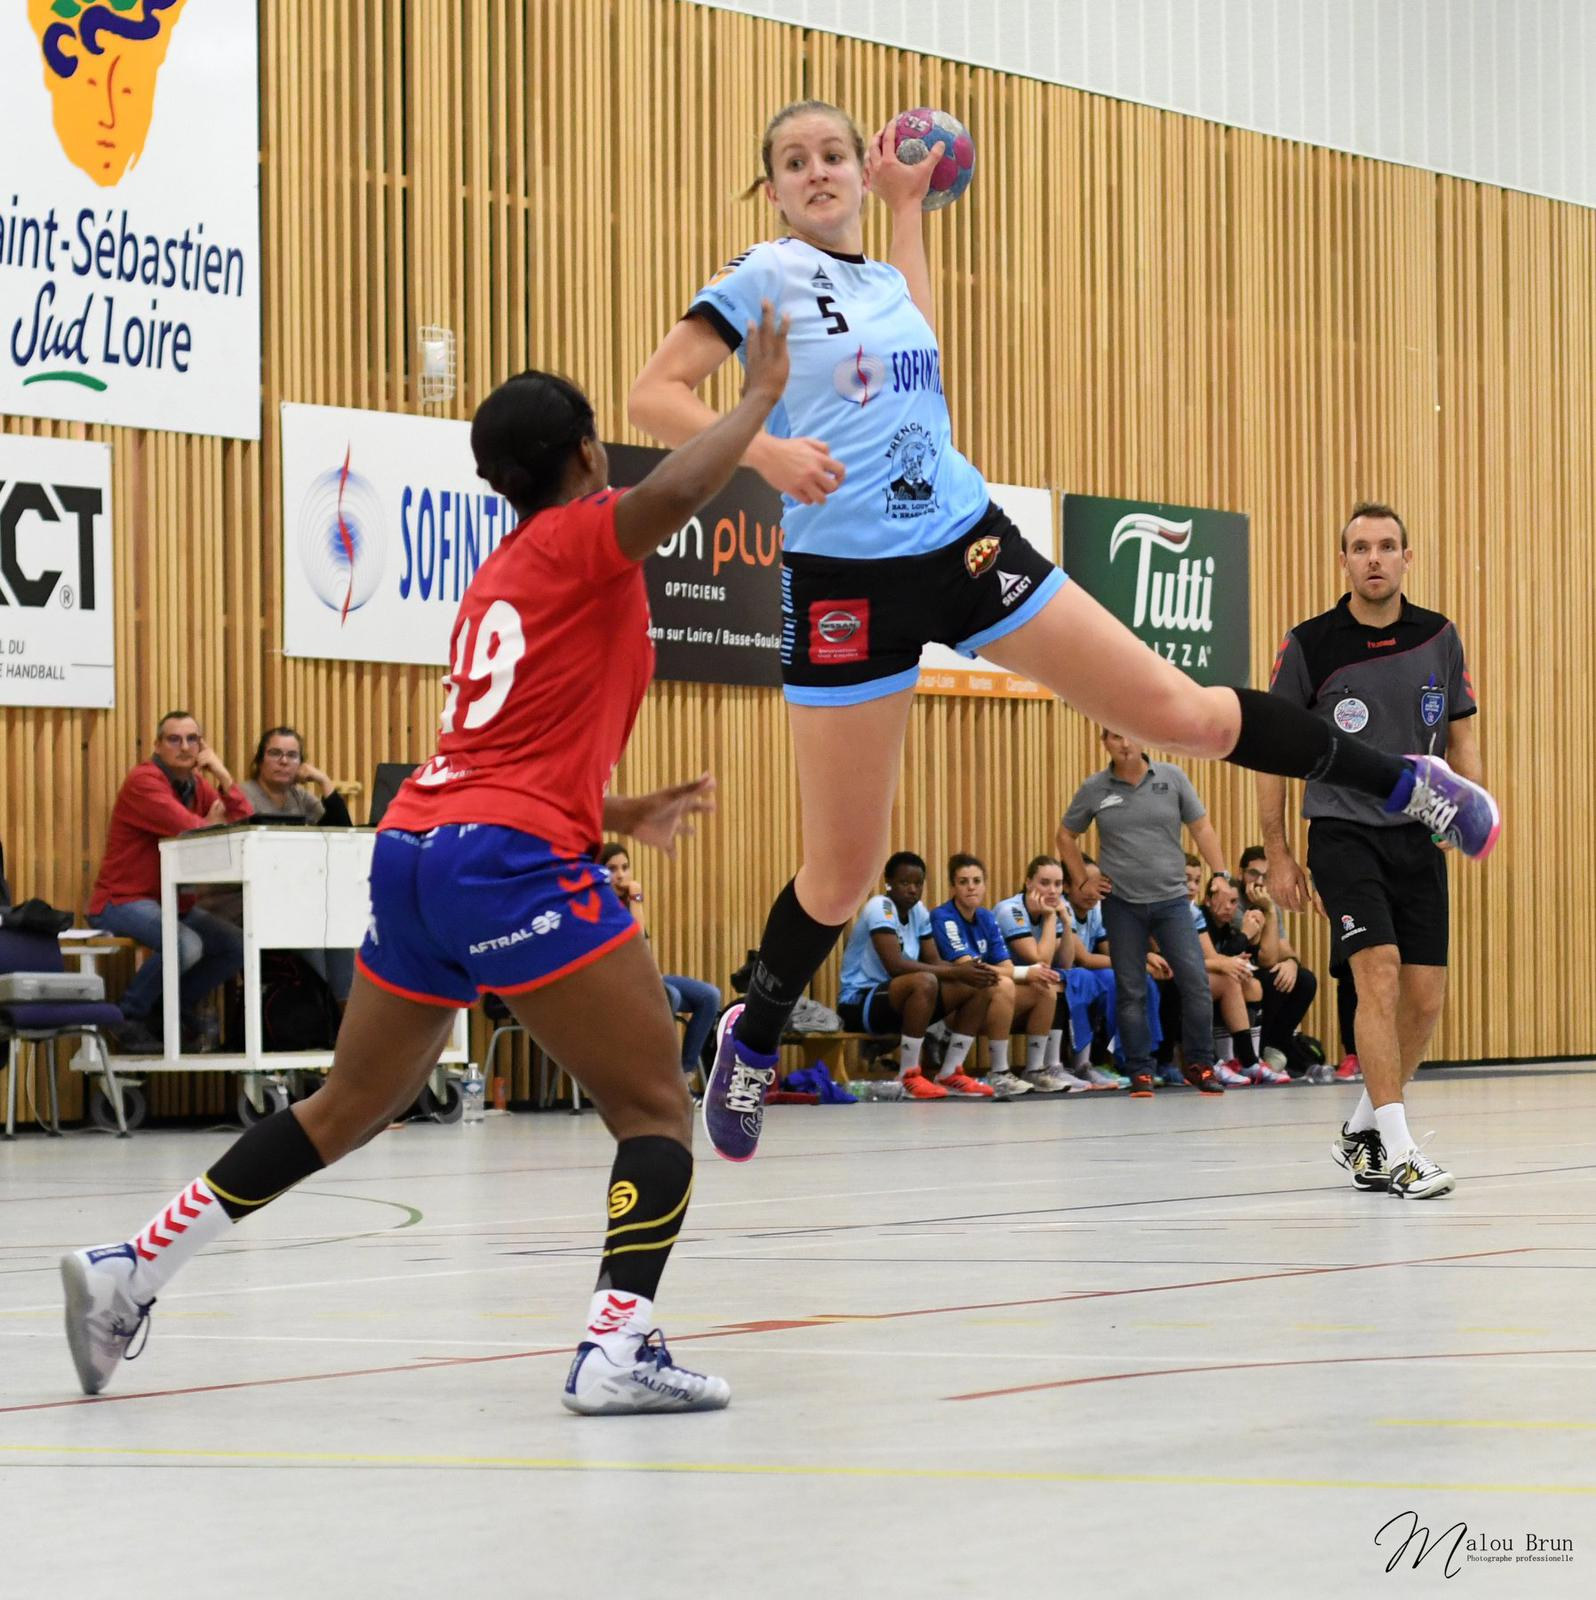 Chloé simon rejoint la cjb handball à bouguenais